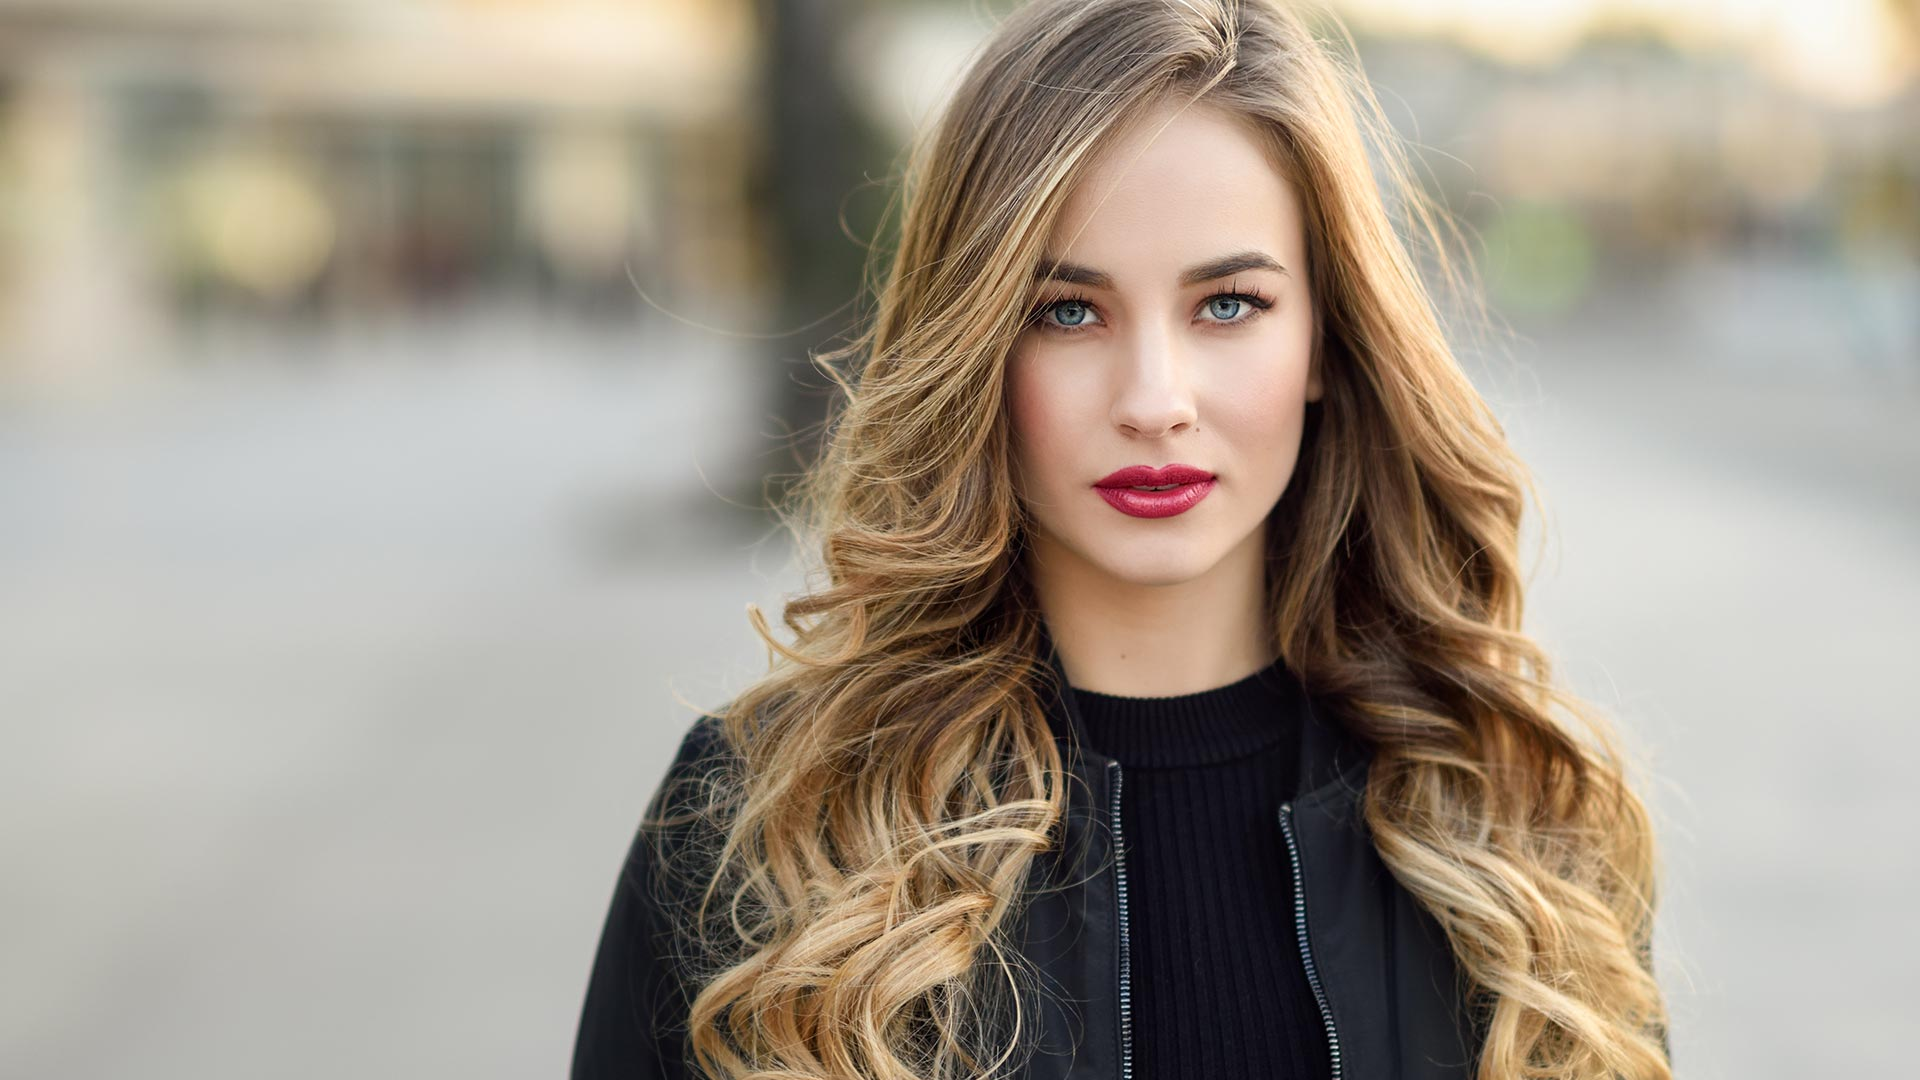 Стрижки на длинный волос мода 2018 года